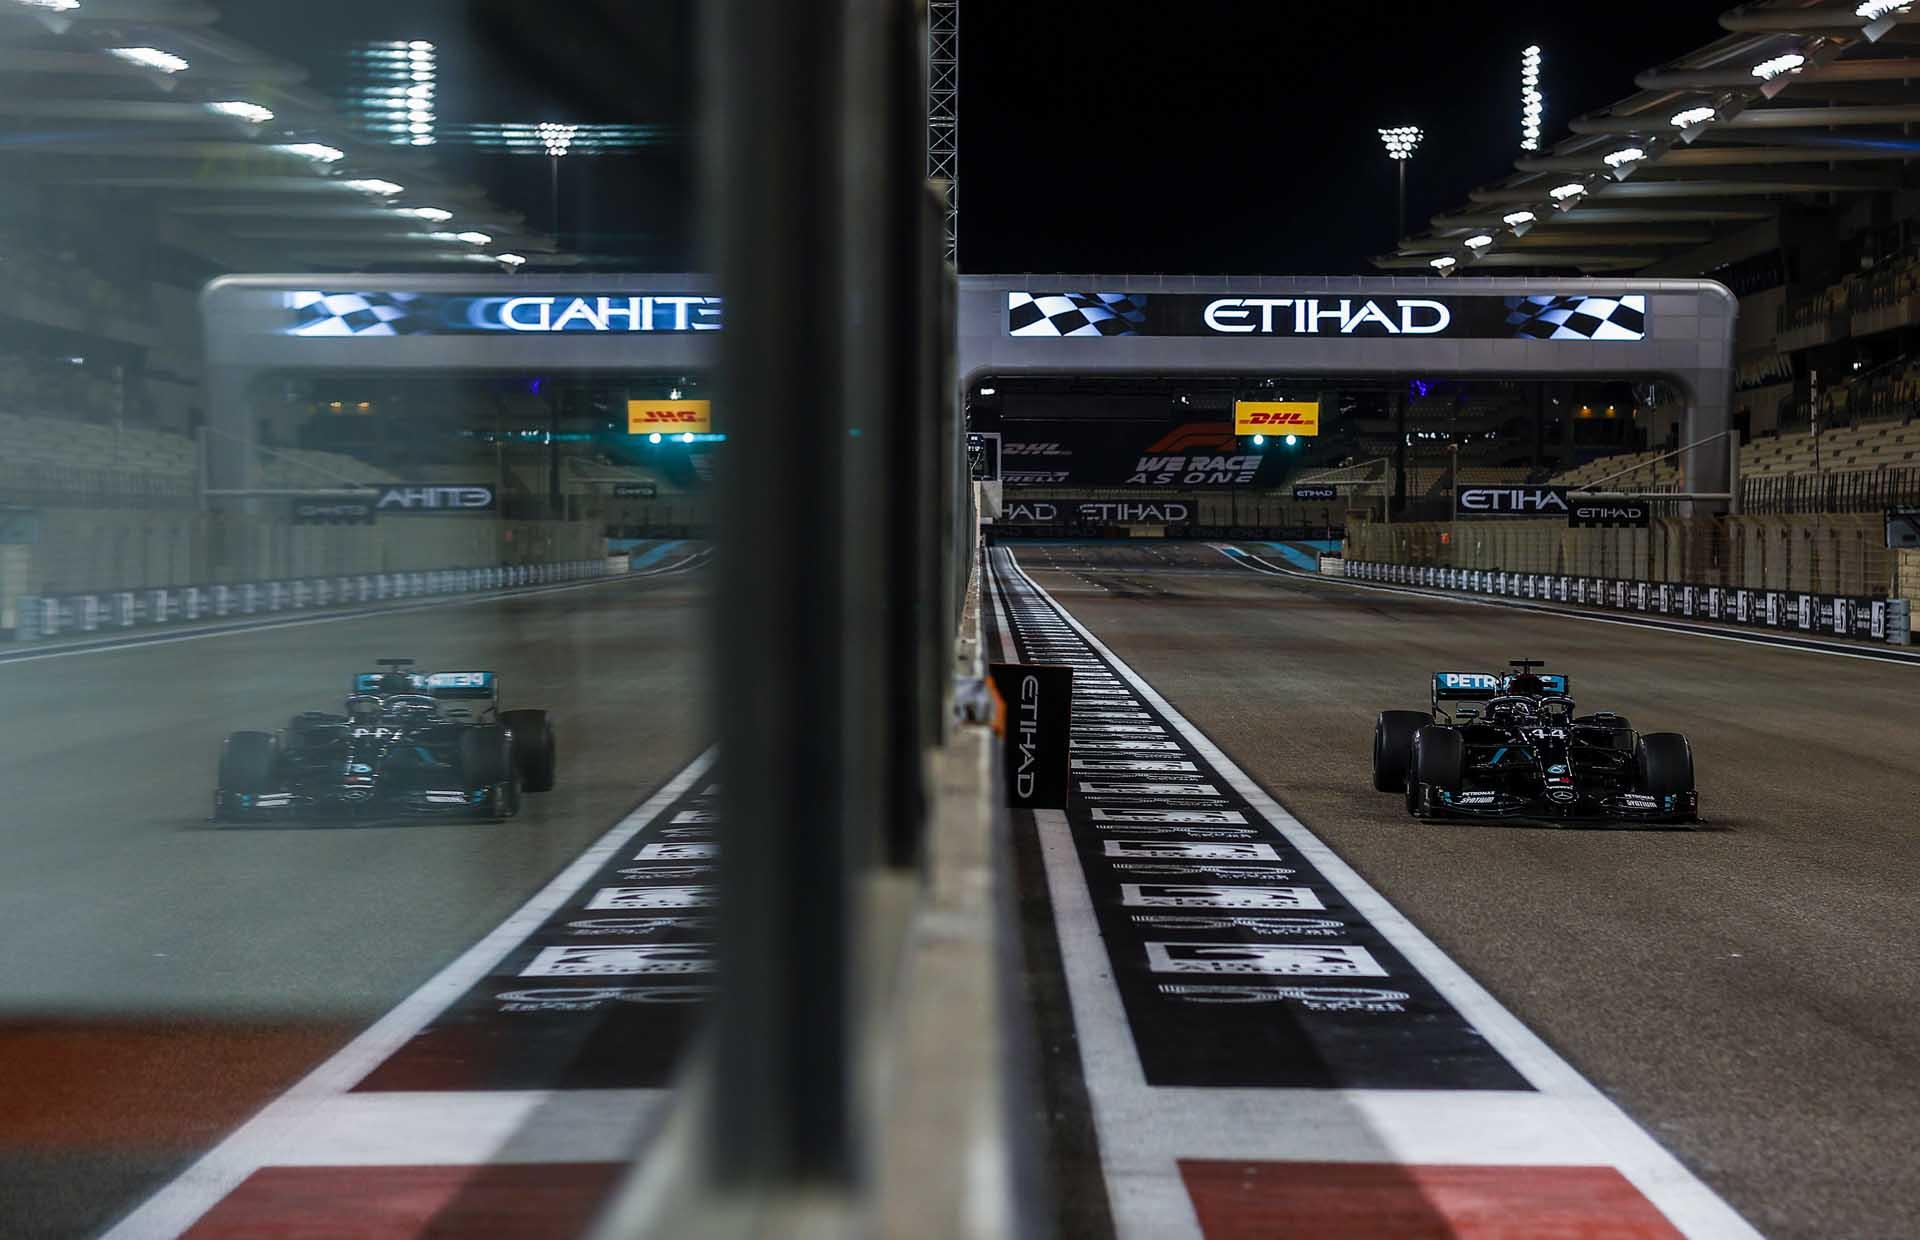 2020 Abu Dhabi Grand Prix, Friday - LAT Images